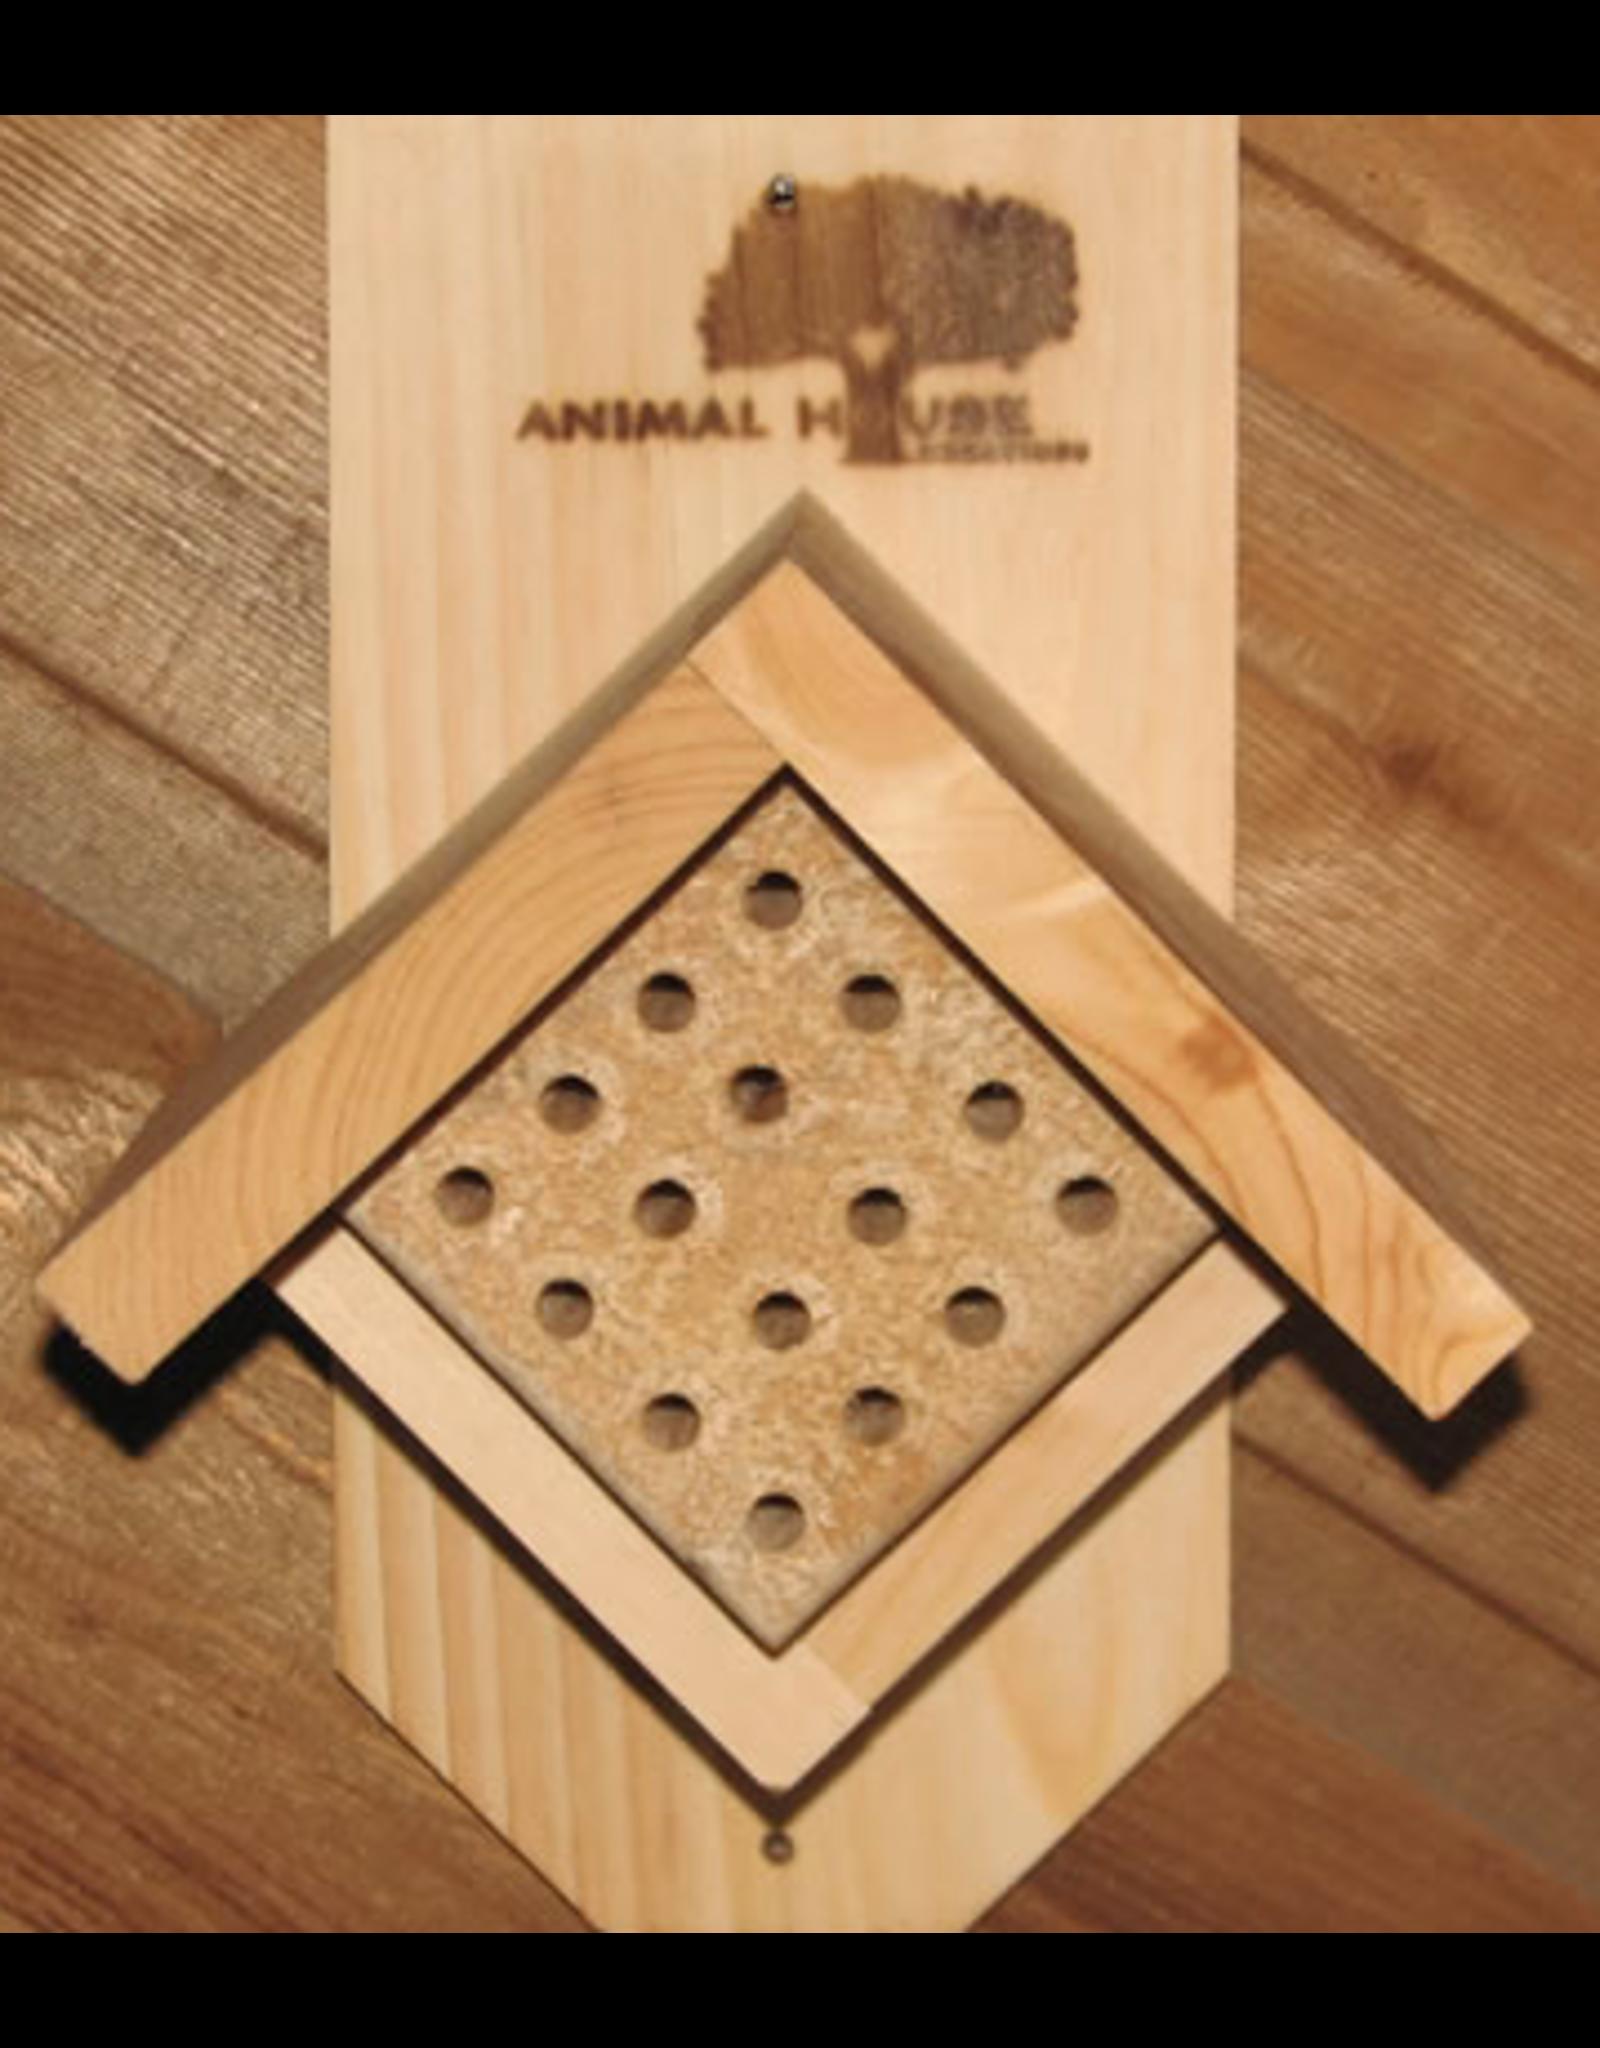 Animal House Creations AHC32 Bee House